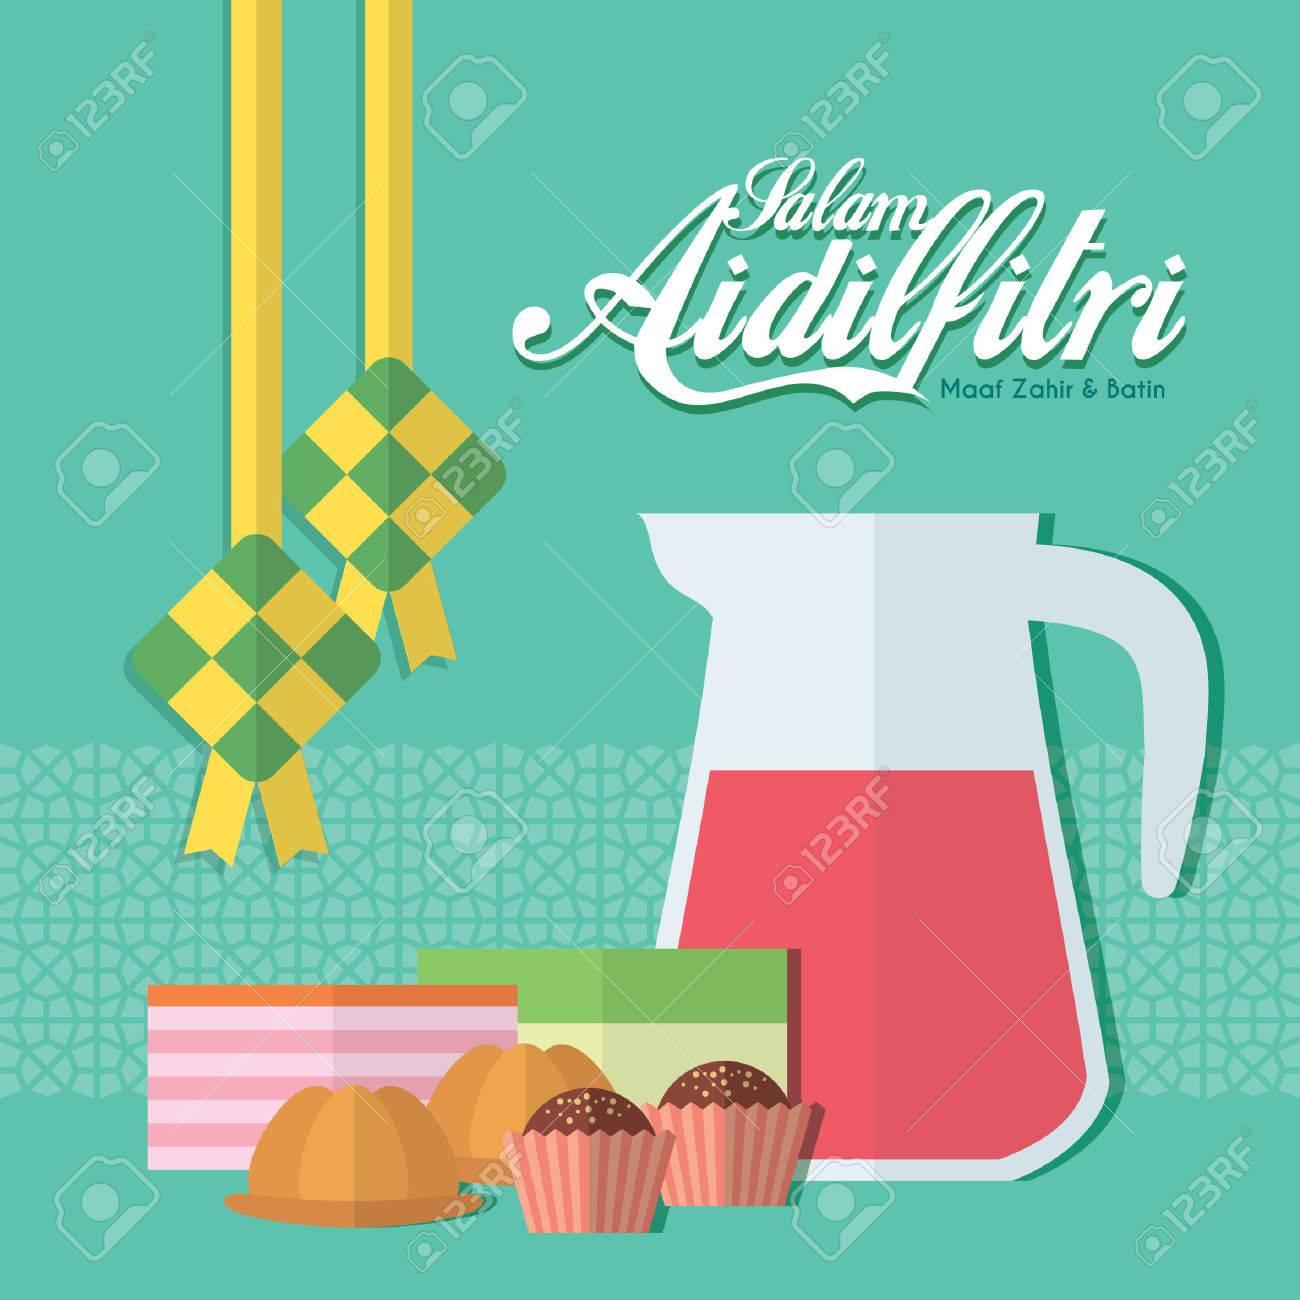 Salam aidilfitri greeting card with ketupat malay rice dumpling salam aidilfitri greeting card with ketupat malay rice dumpling kuih muih malay kristyandbryce Images